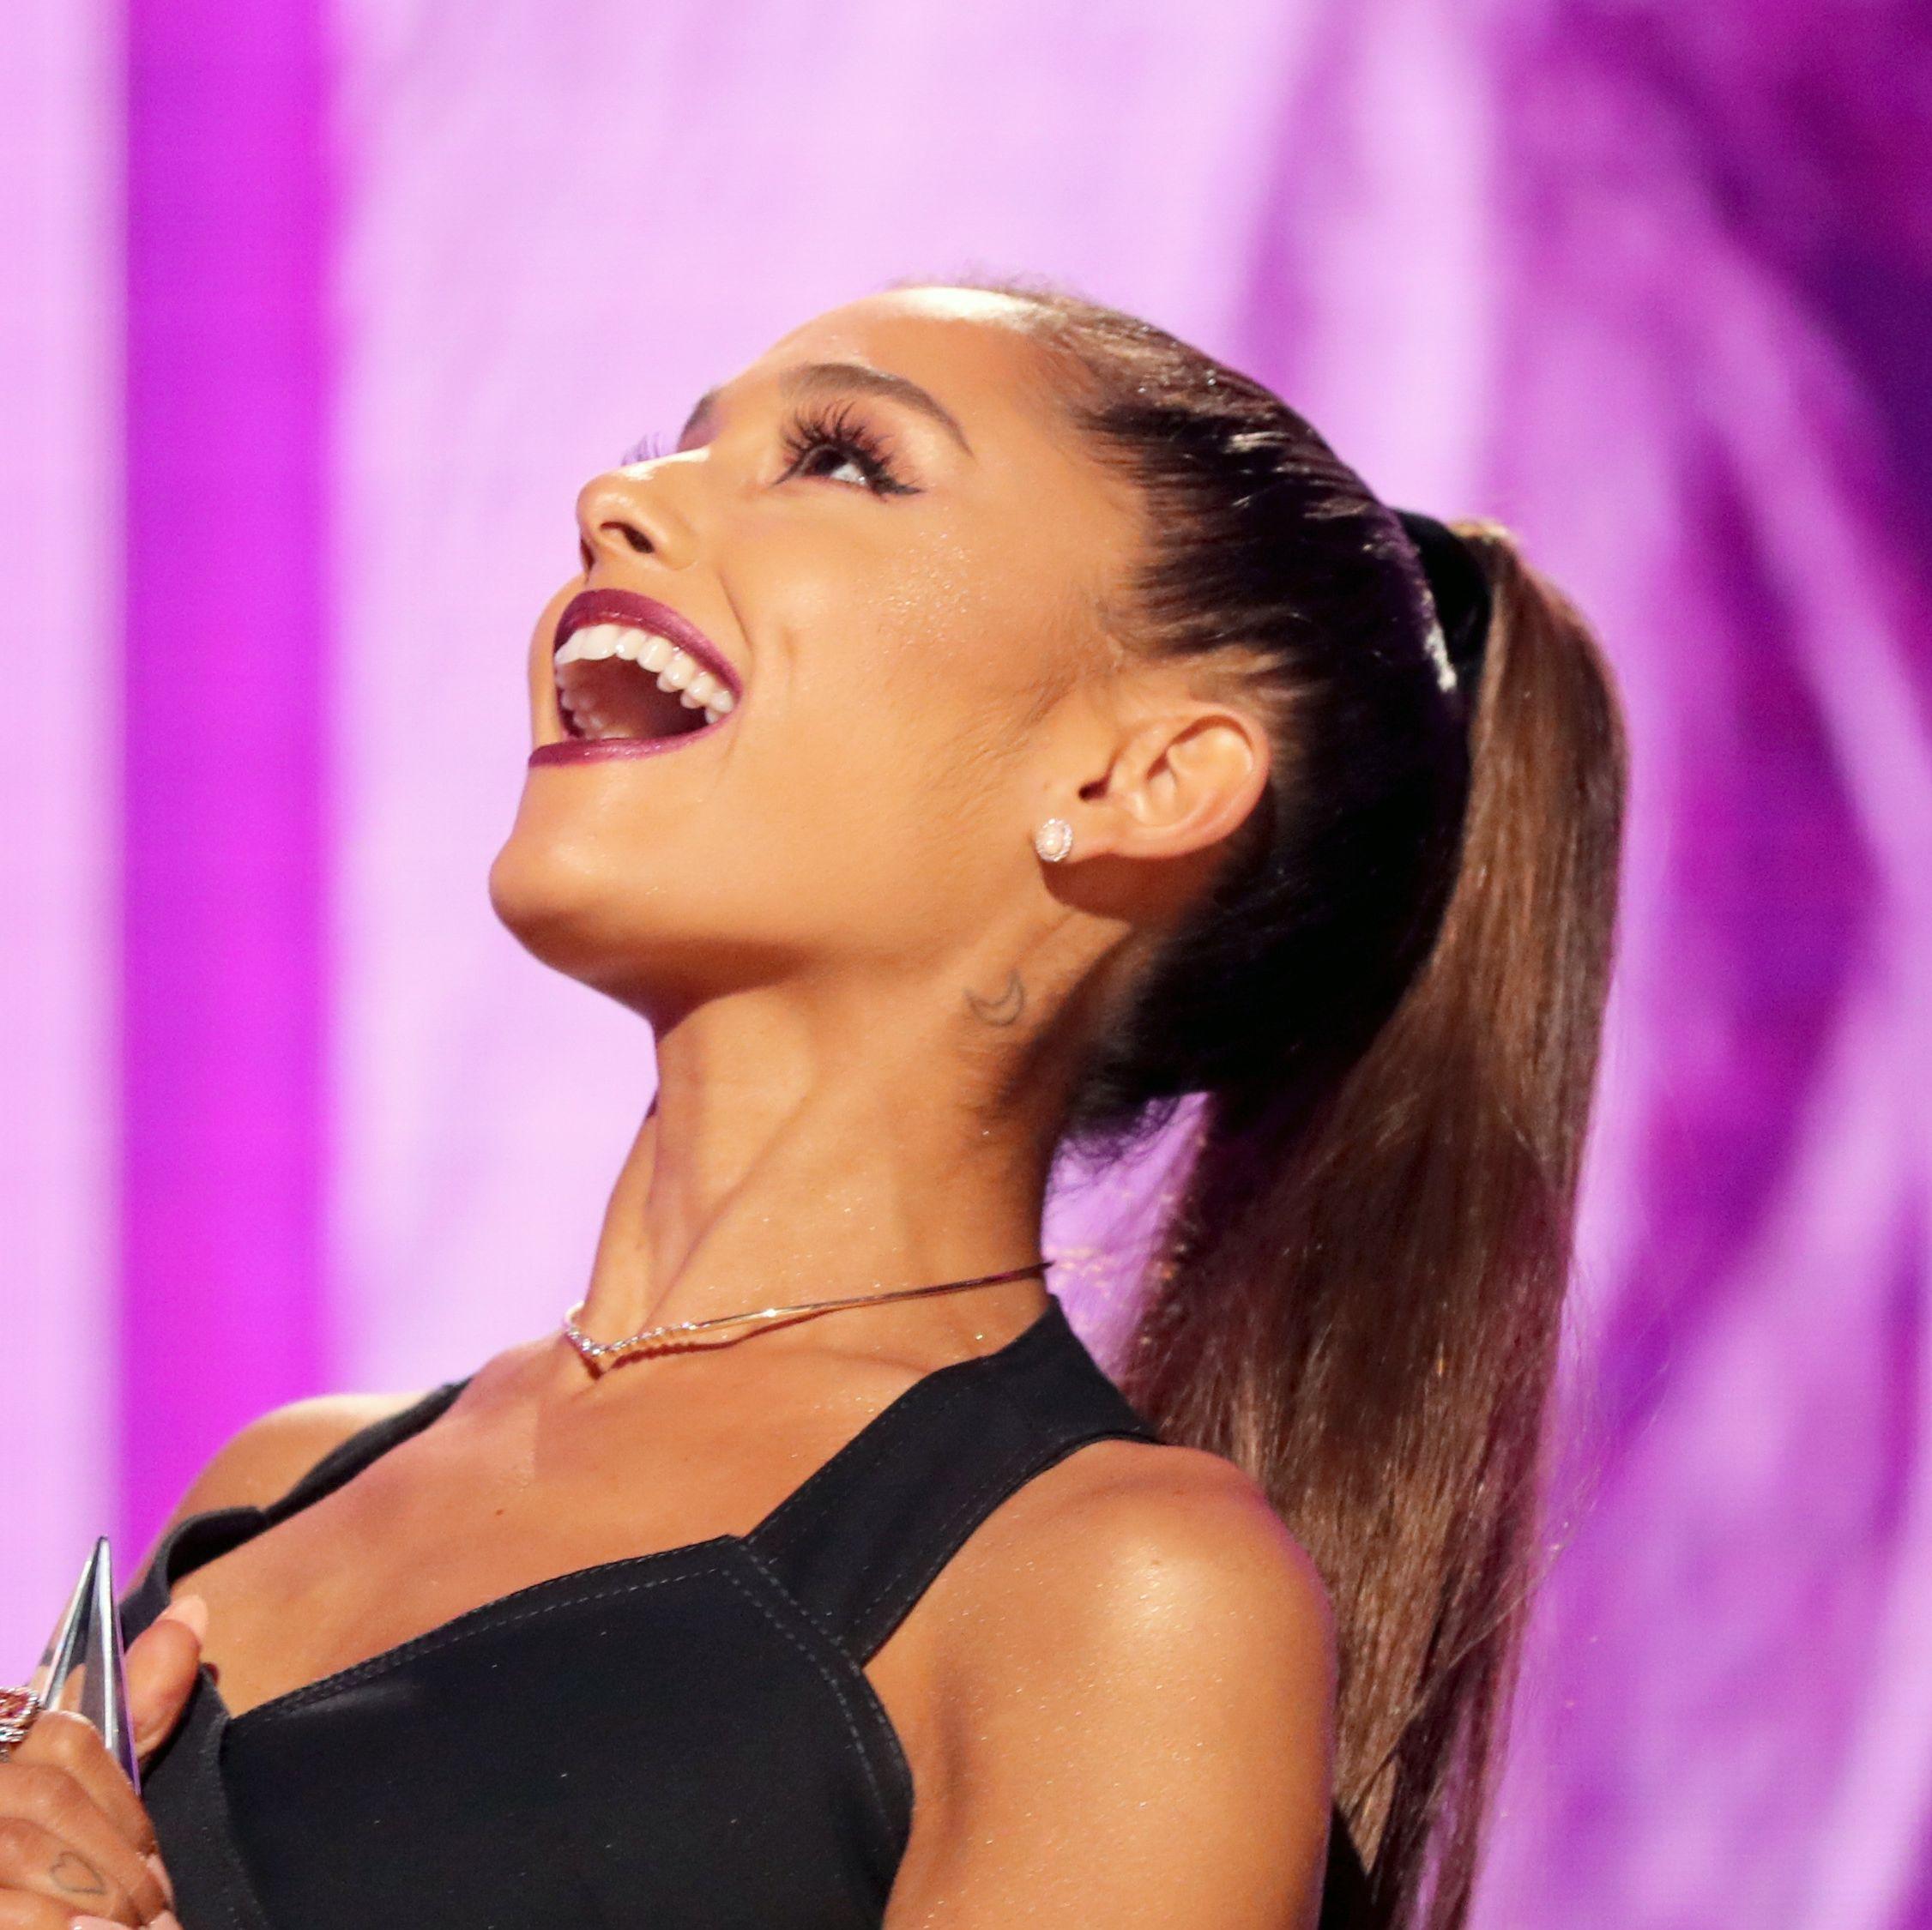 Ariana Grande Got Hilariously Trolled by Pet Subscription Company Barkbox